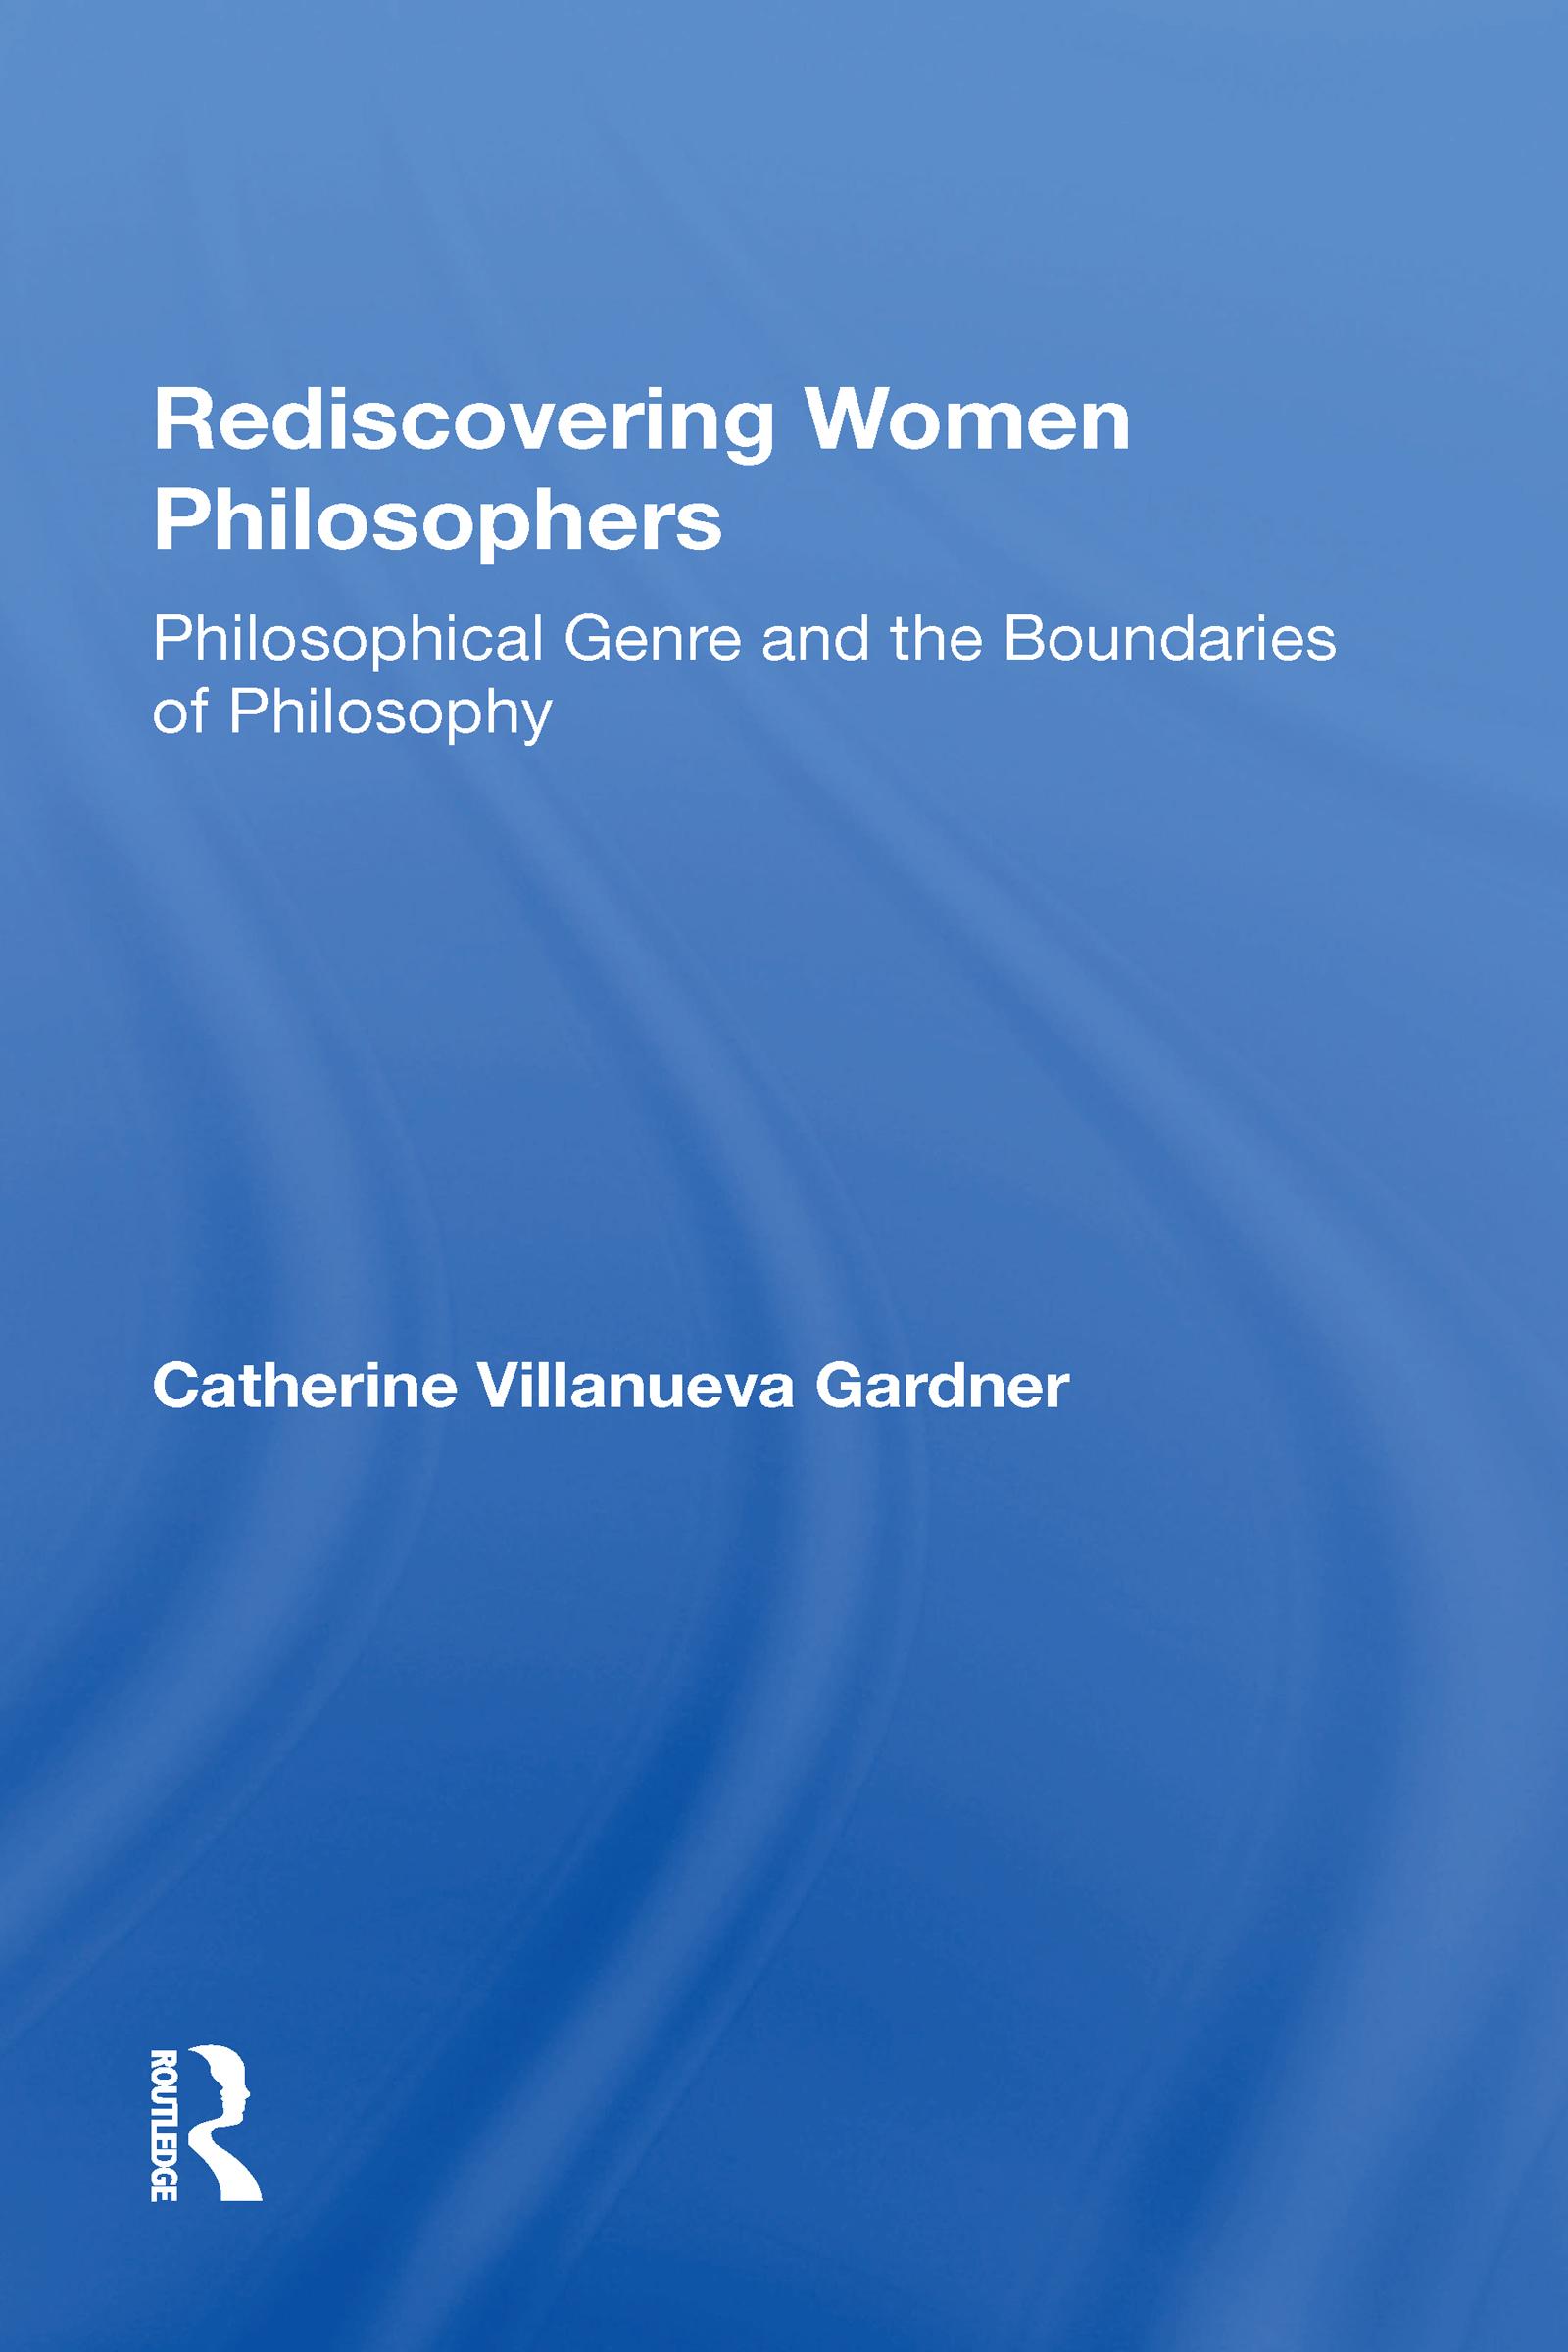 Rediscovering Women Philosophers